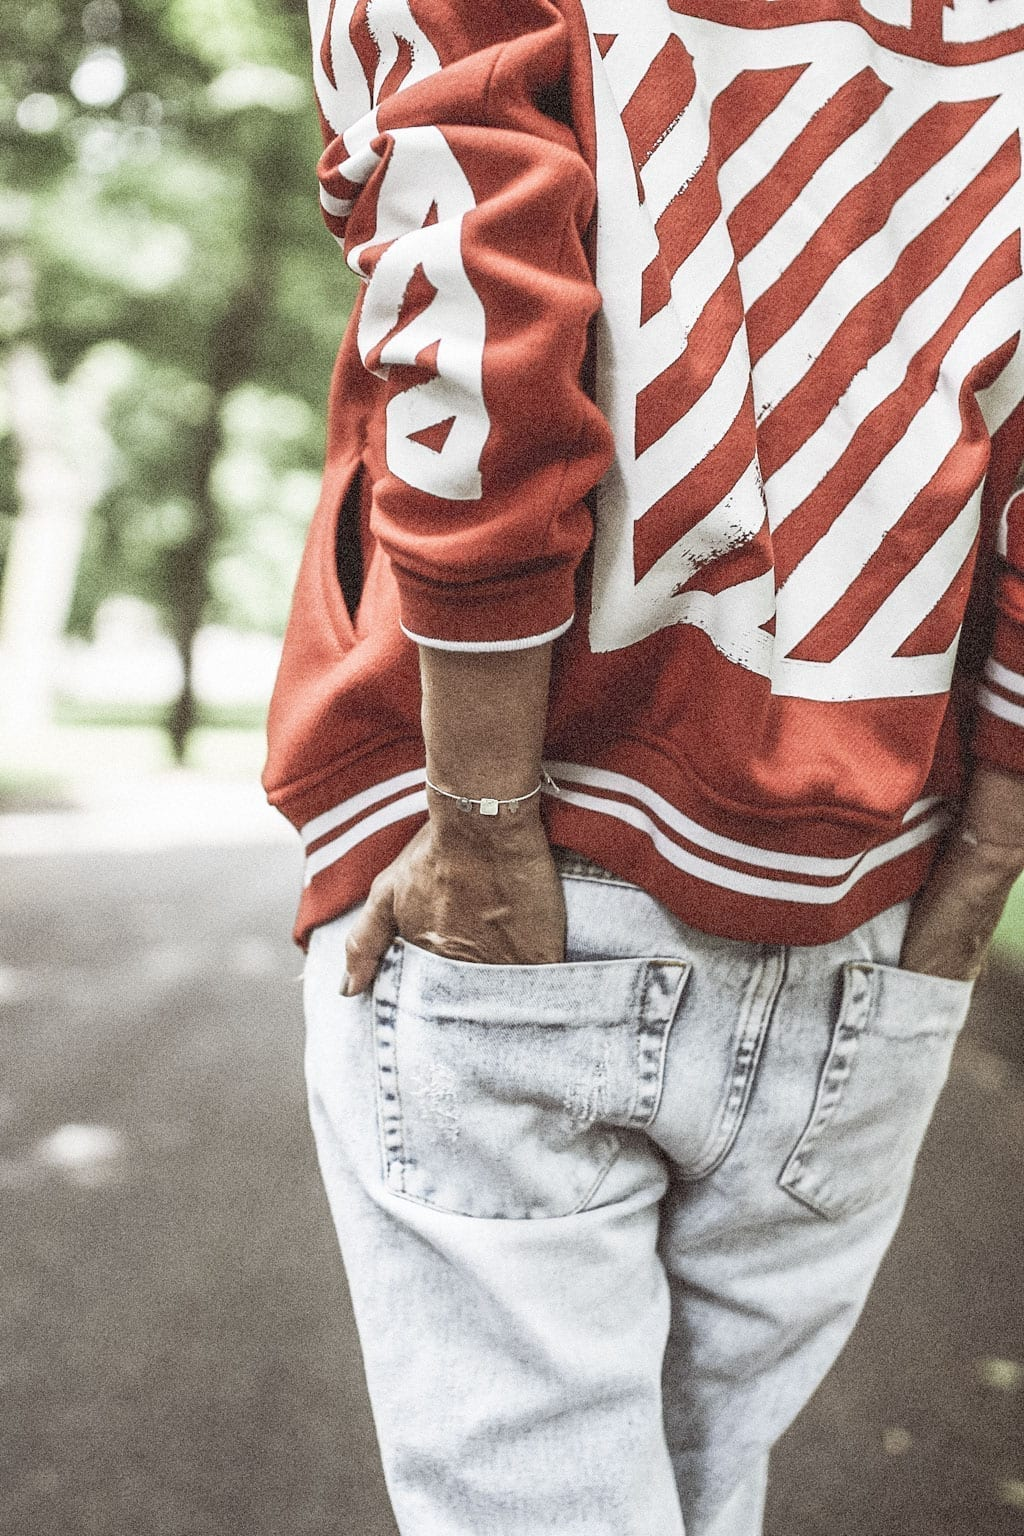 Constantly-K-karin-kaswurm-white-red-rieger-jacket-salzburg-fashion-street-style-9066